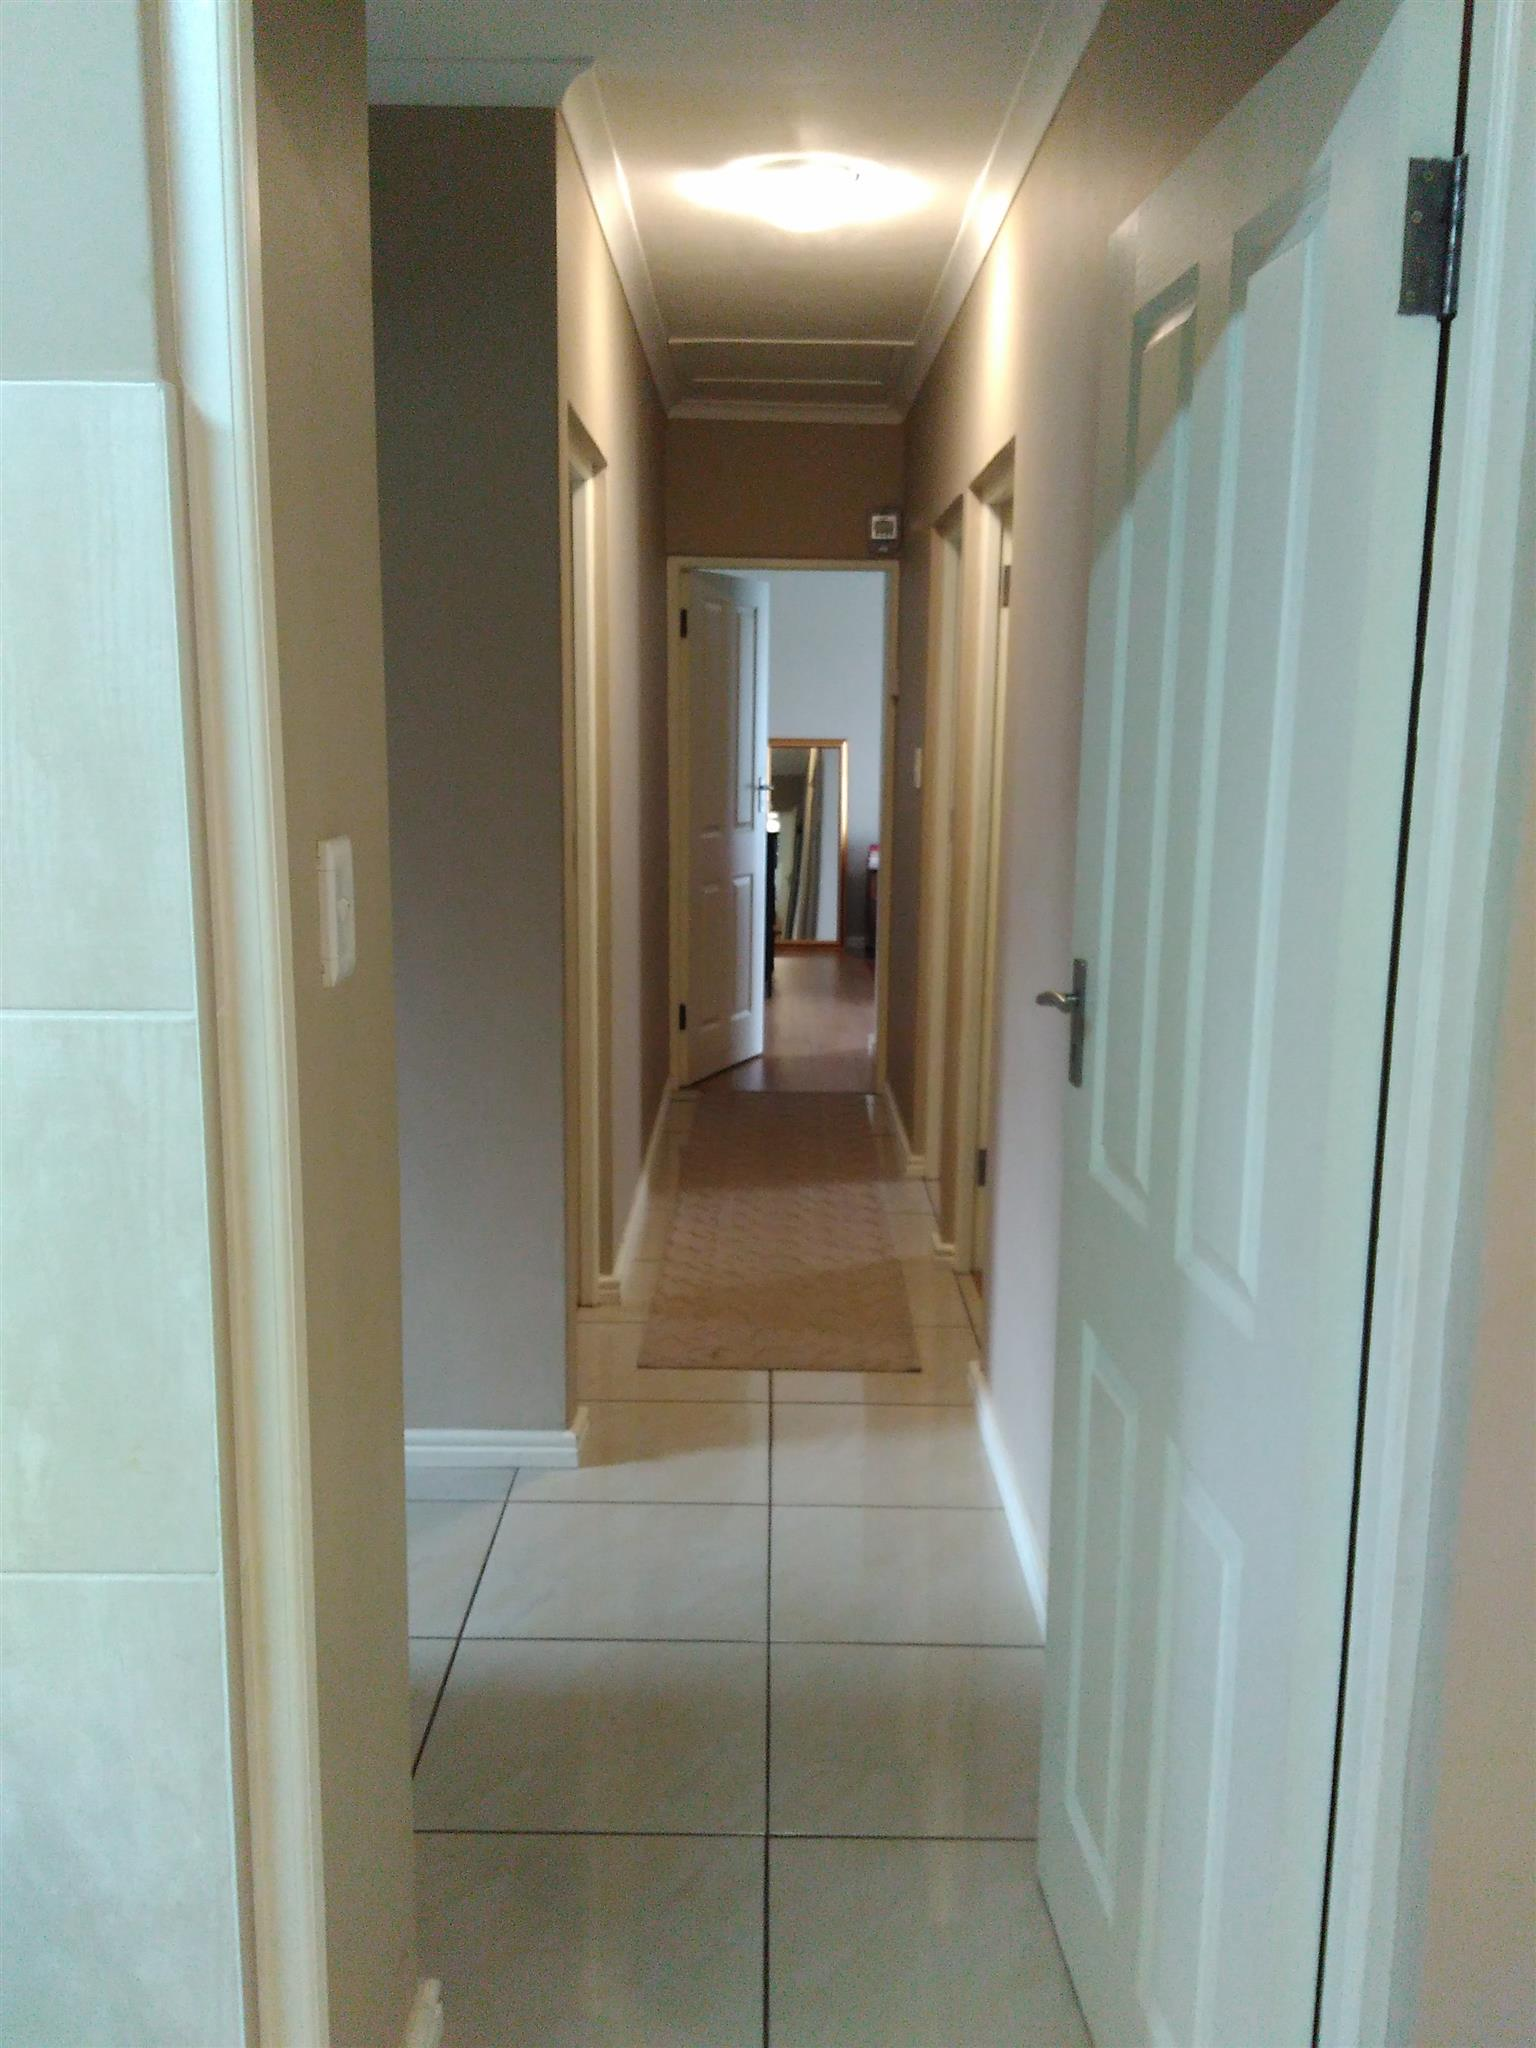 Large 4 bedroom house for sale in upmarket Haasendal (Kuilsriver)